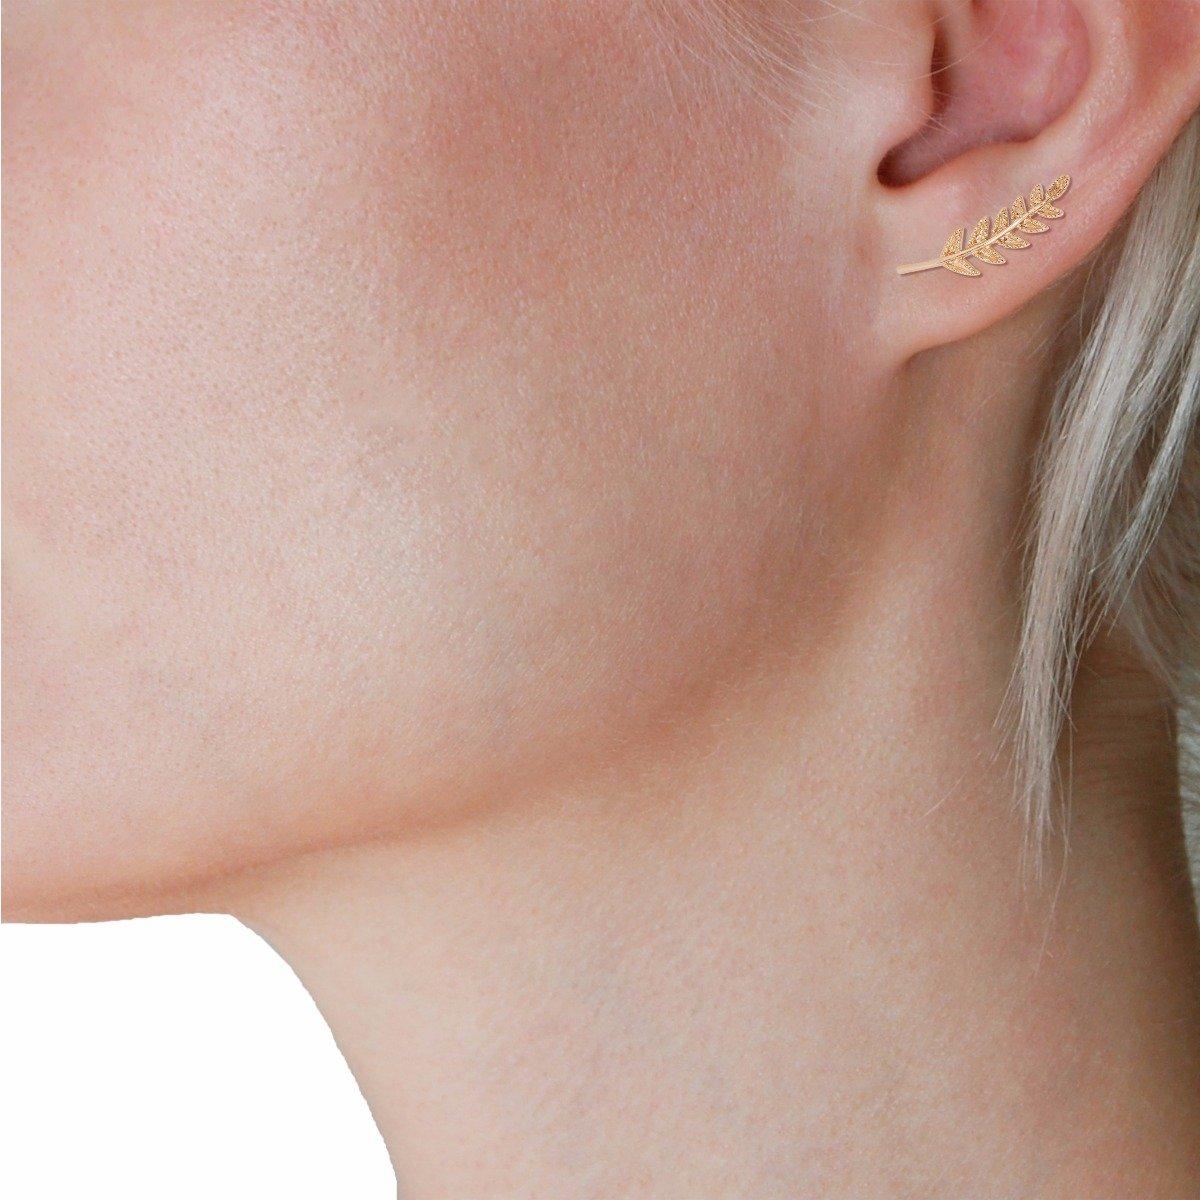 b5cd76fe2 Amazon.com: Humble Chic Tiny Leaf Ear Climbers - Delicate Crawler Cuff Stud  Jacket Earrings, Gold-Tone: Jewelry